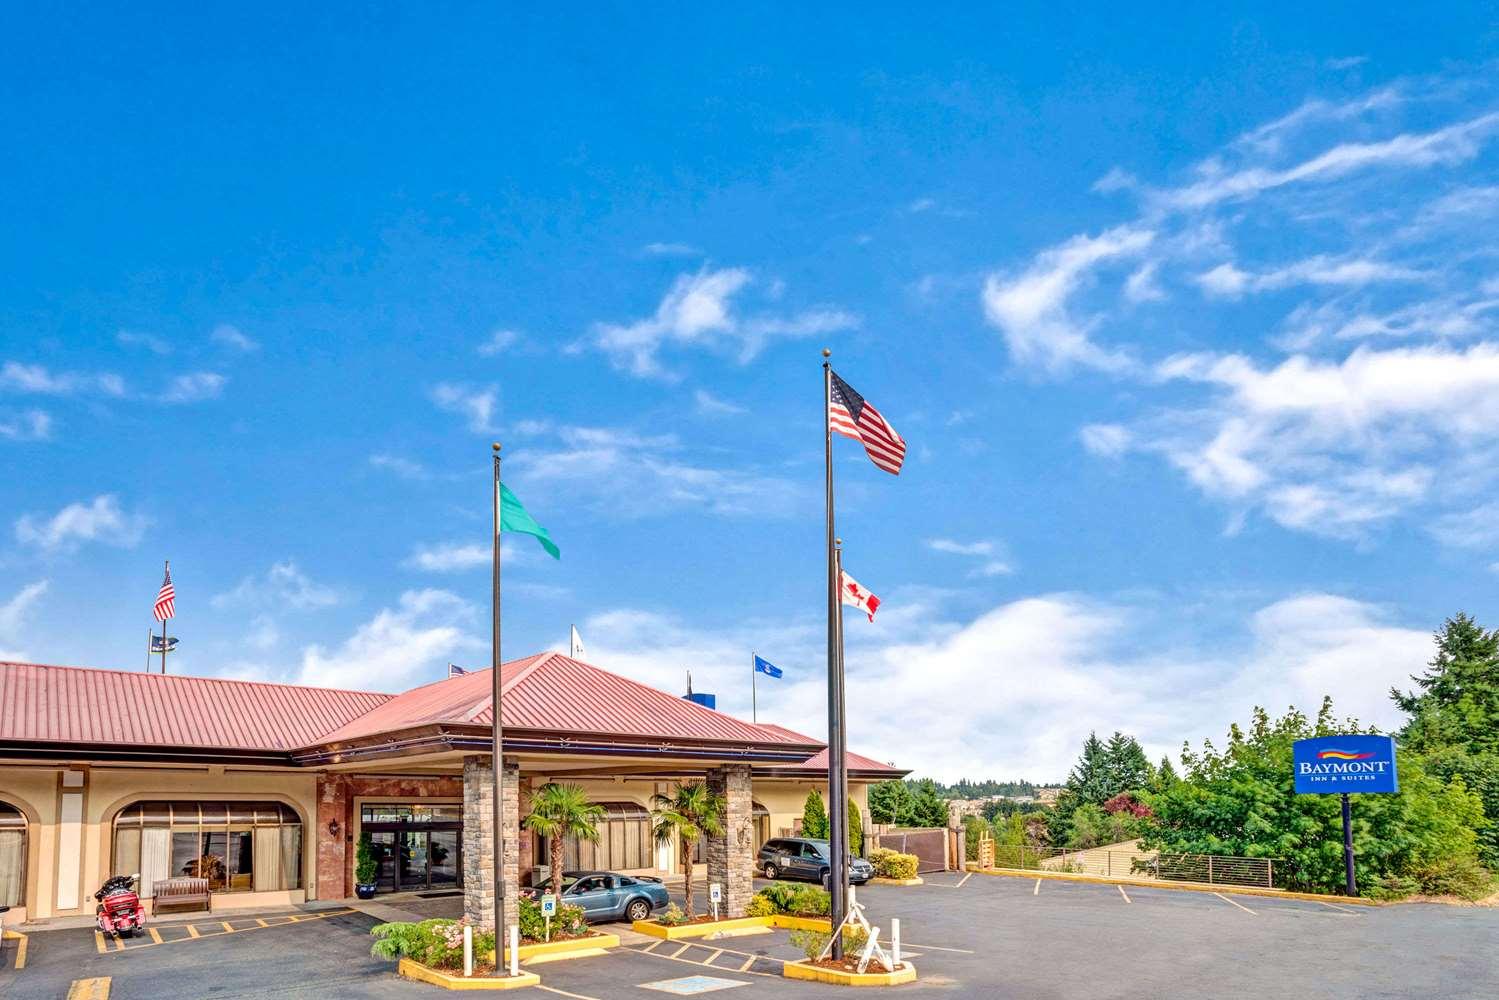 Baymont Inn & Suites Bremerton WA